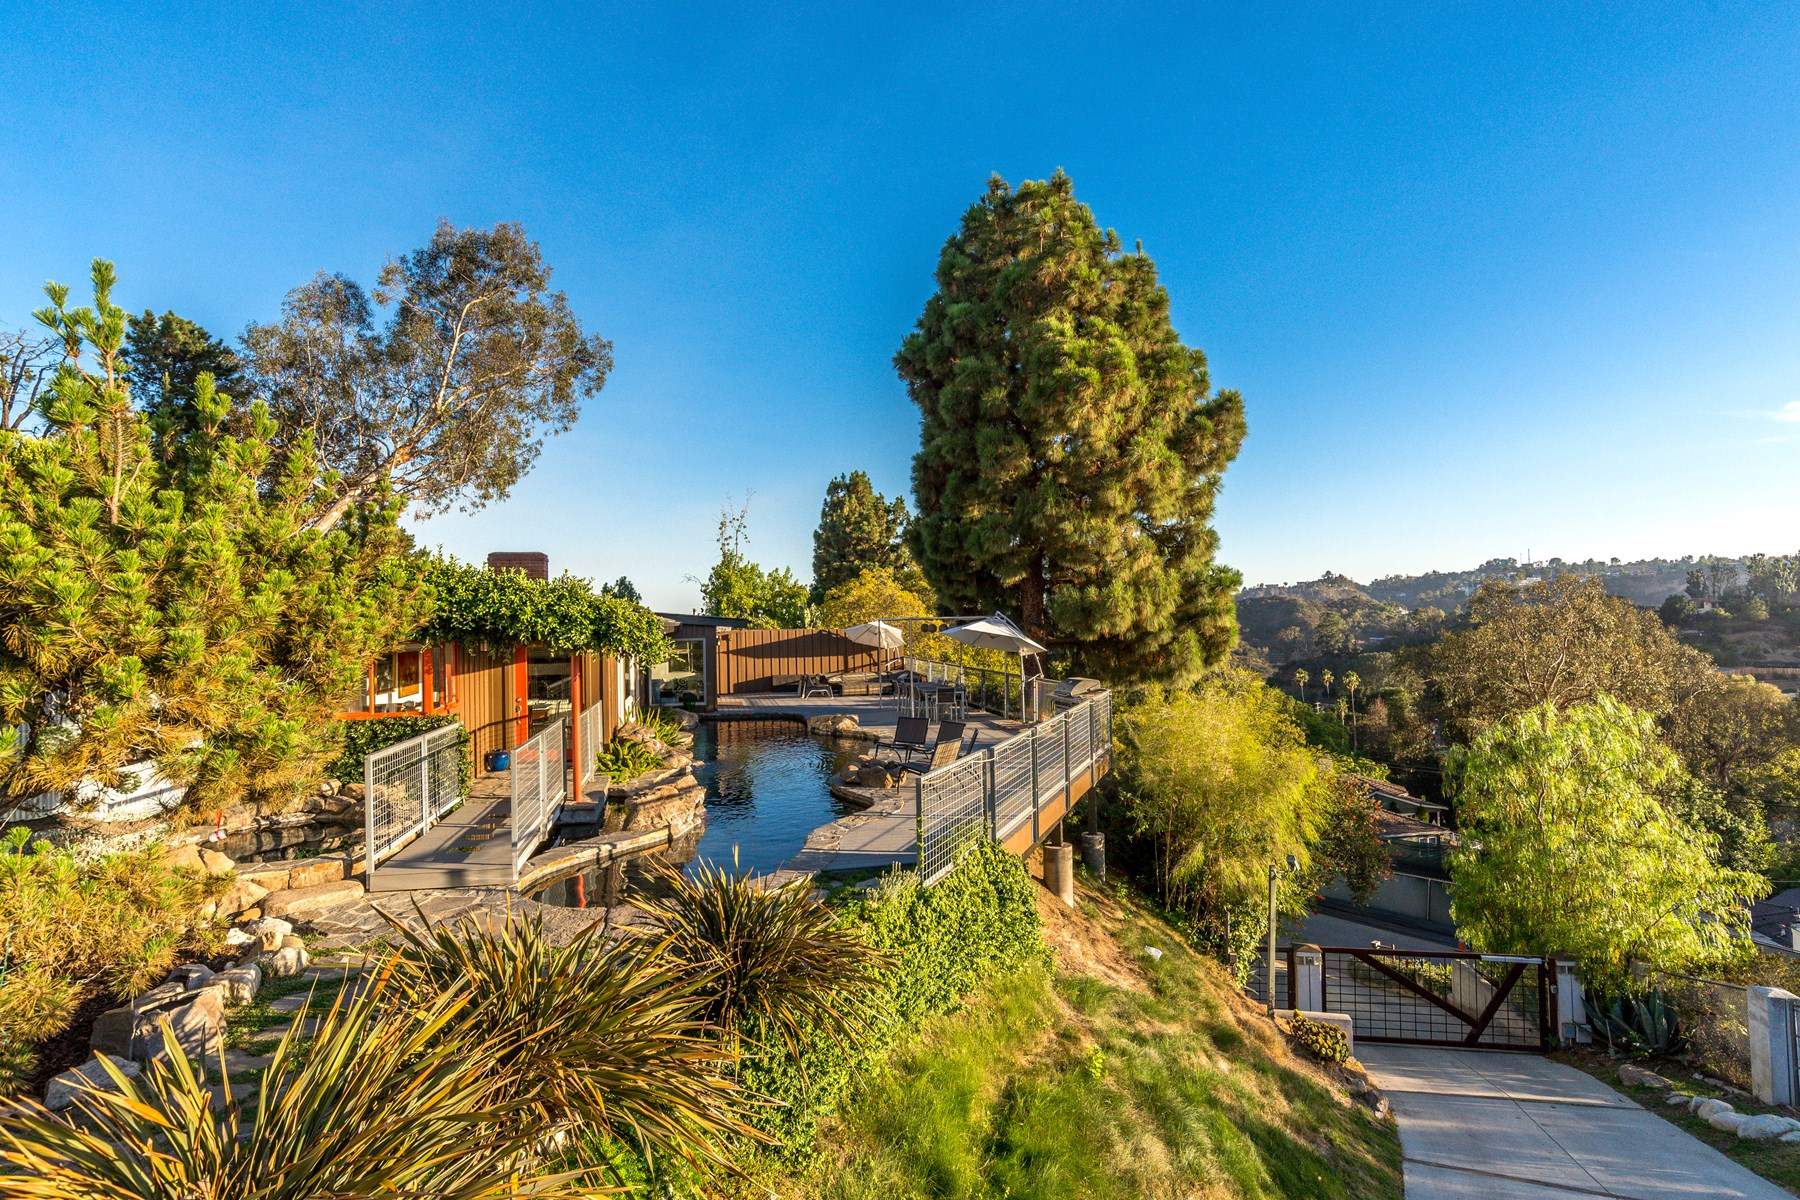 Moradia para Venda às Hollywood Hills Hideaway 2970 Briar Knoll Drive Hollywood Hills, Los Angeles, Califórnia, 90046 Estados Unidos